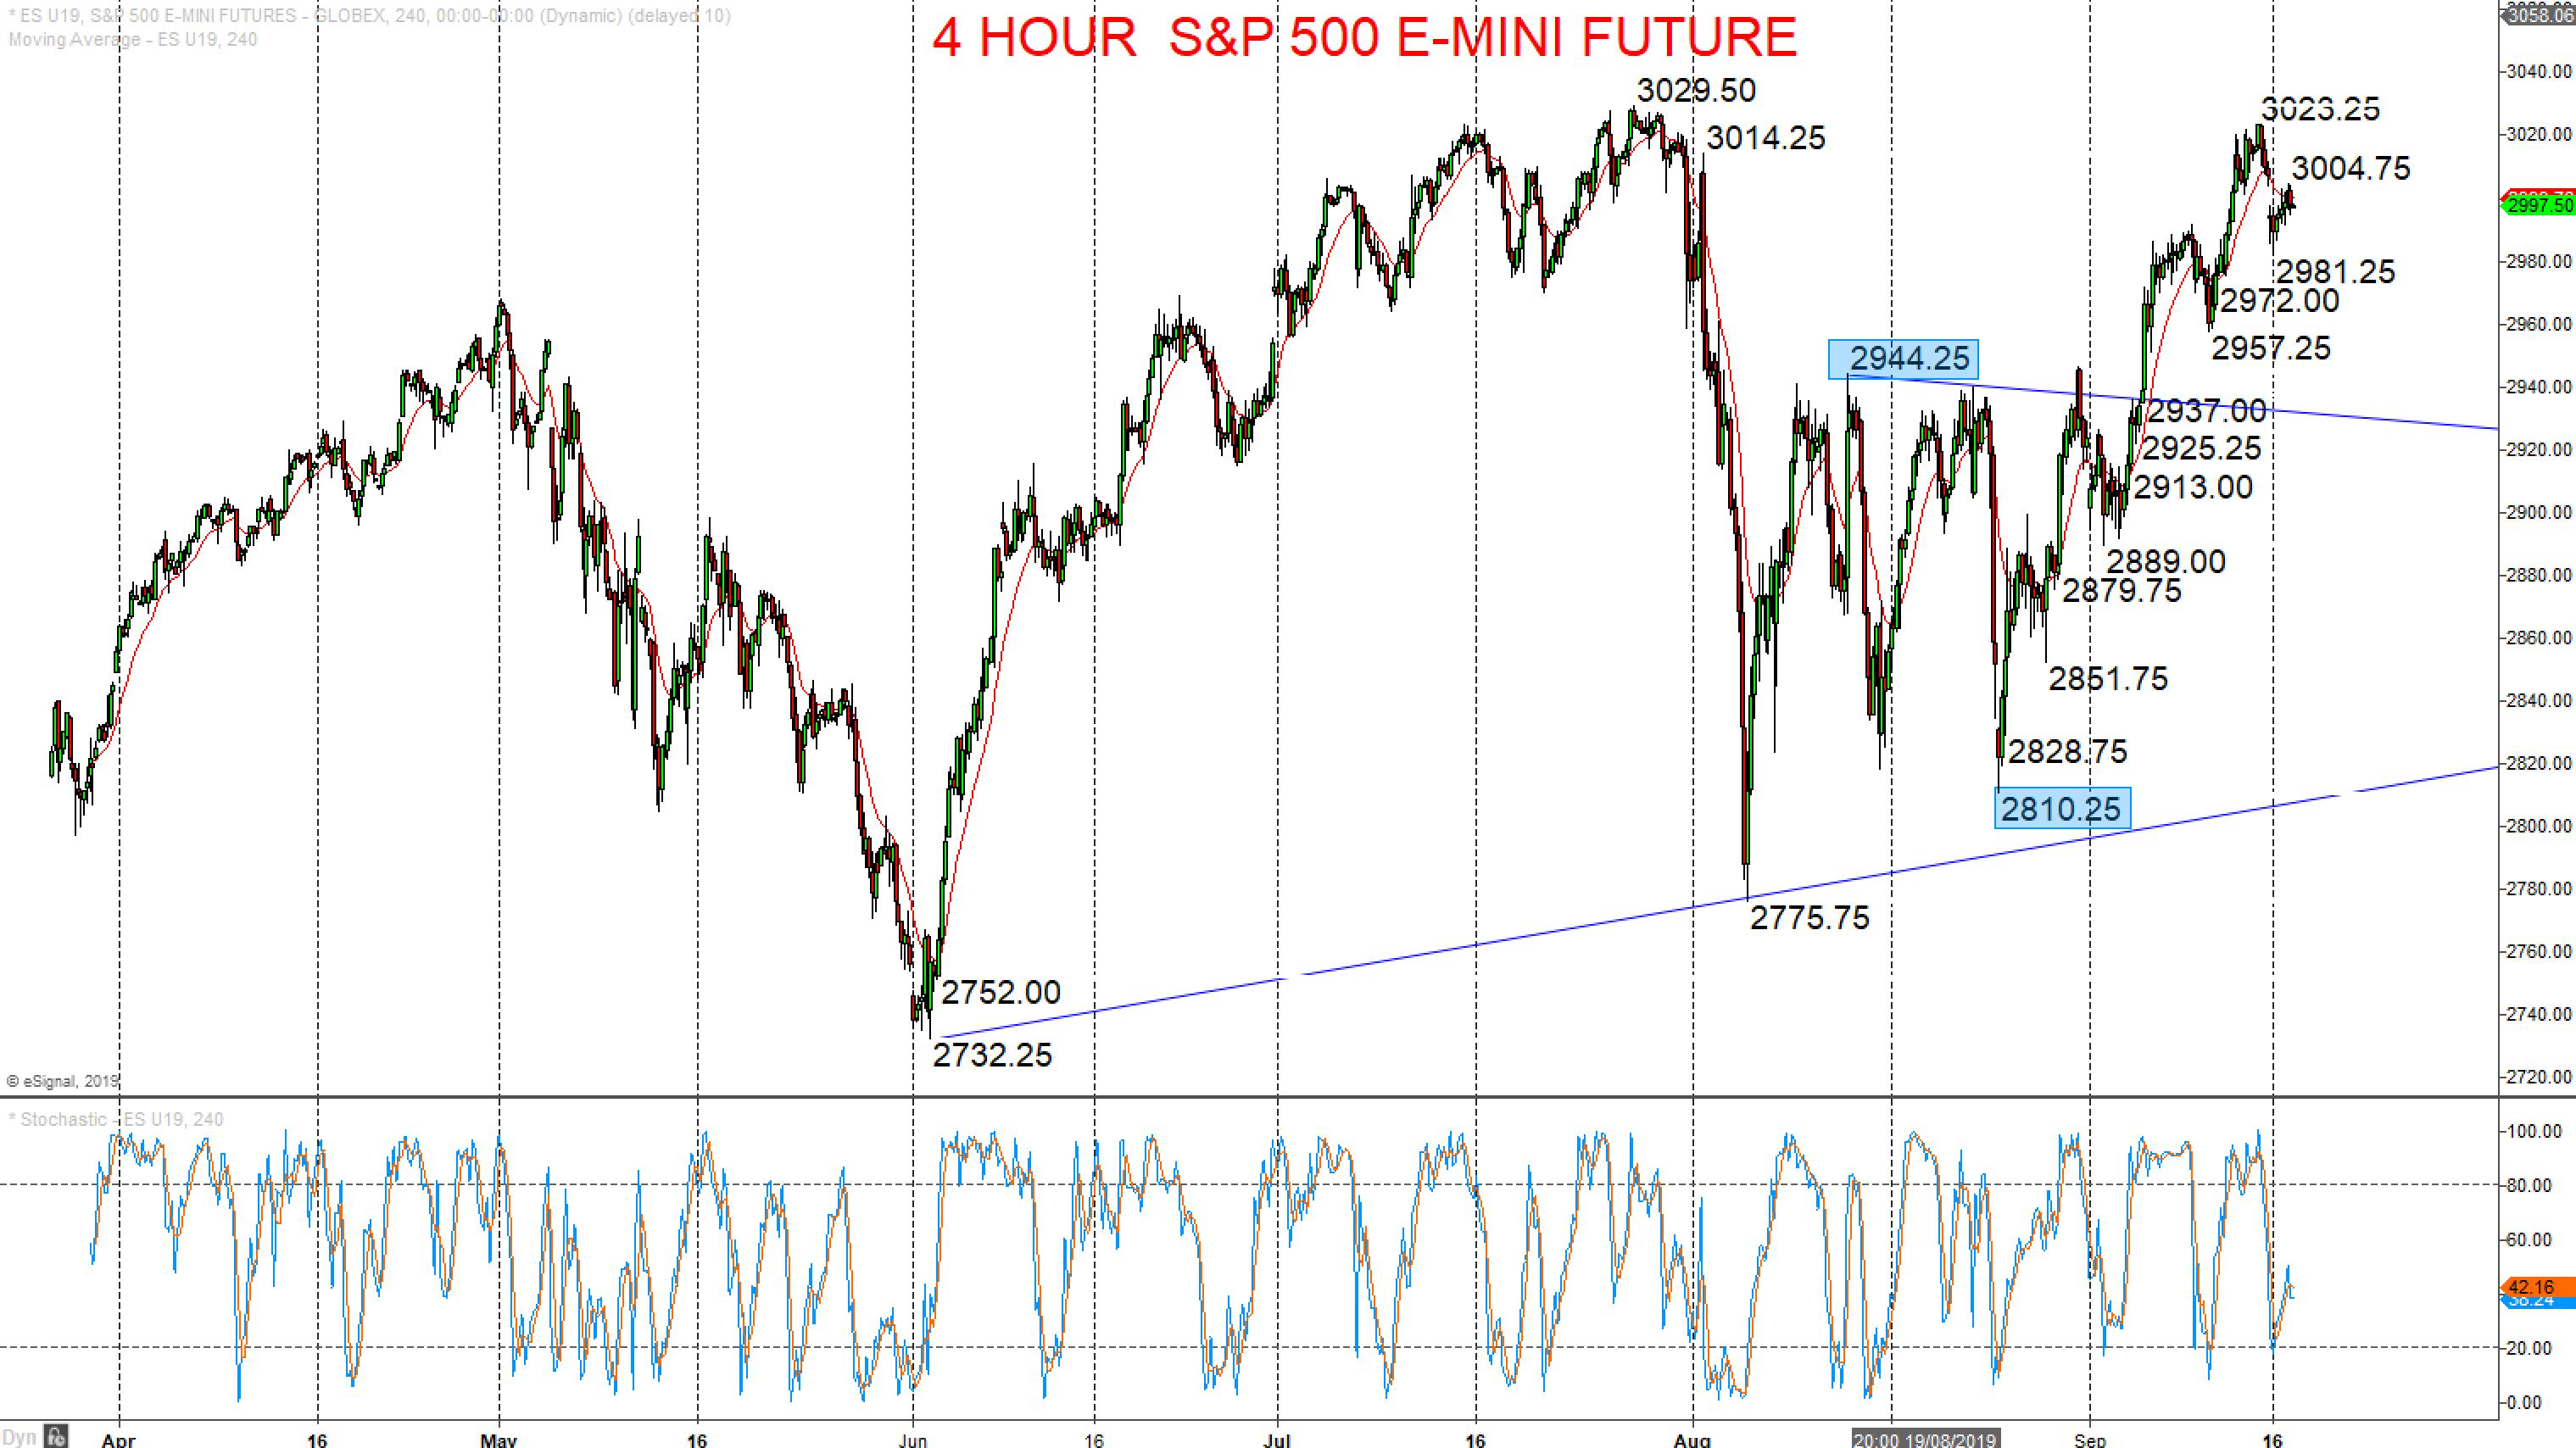 4 Hour S&P 500 E-Mini Future Chart